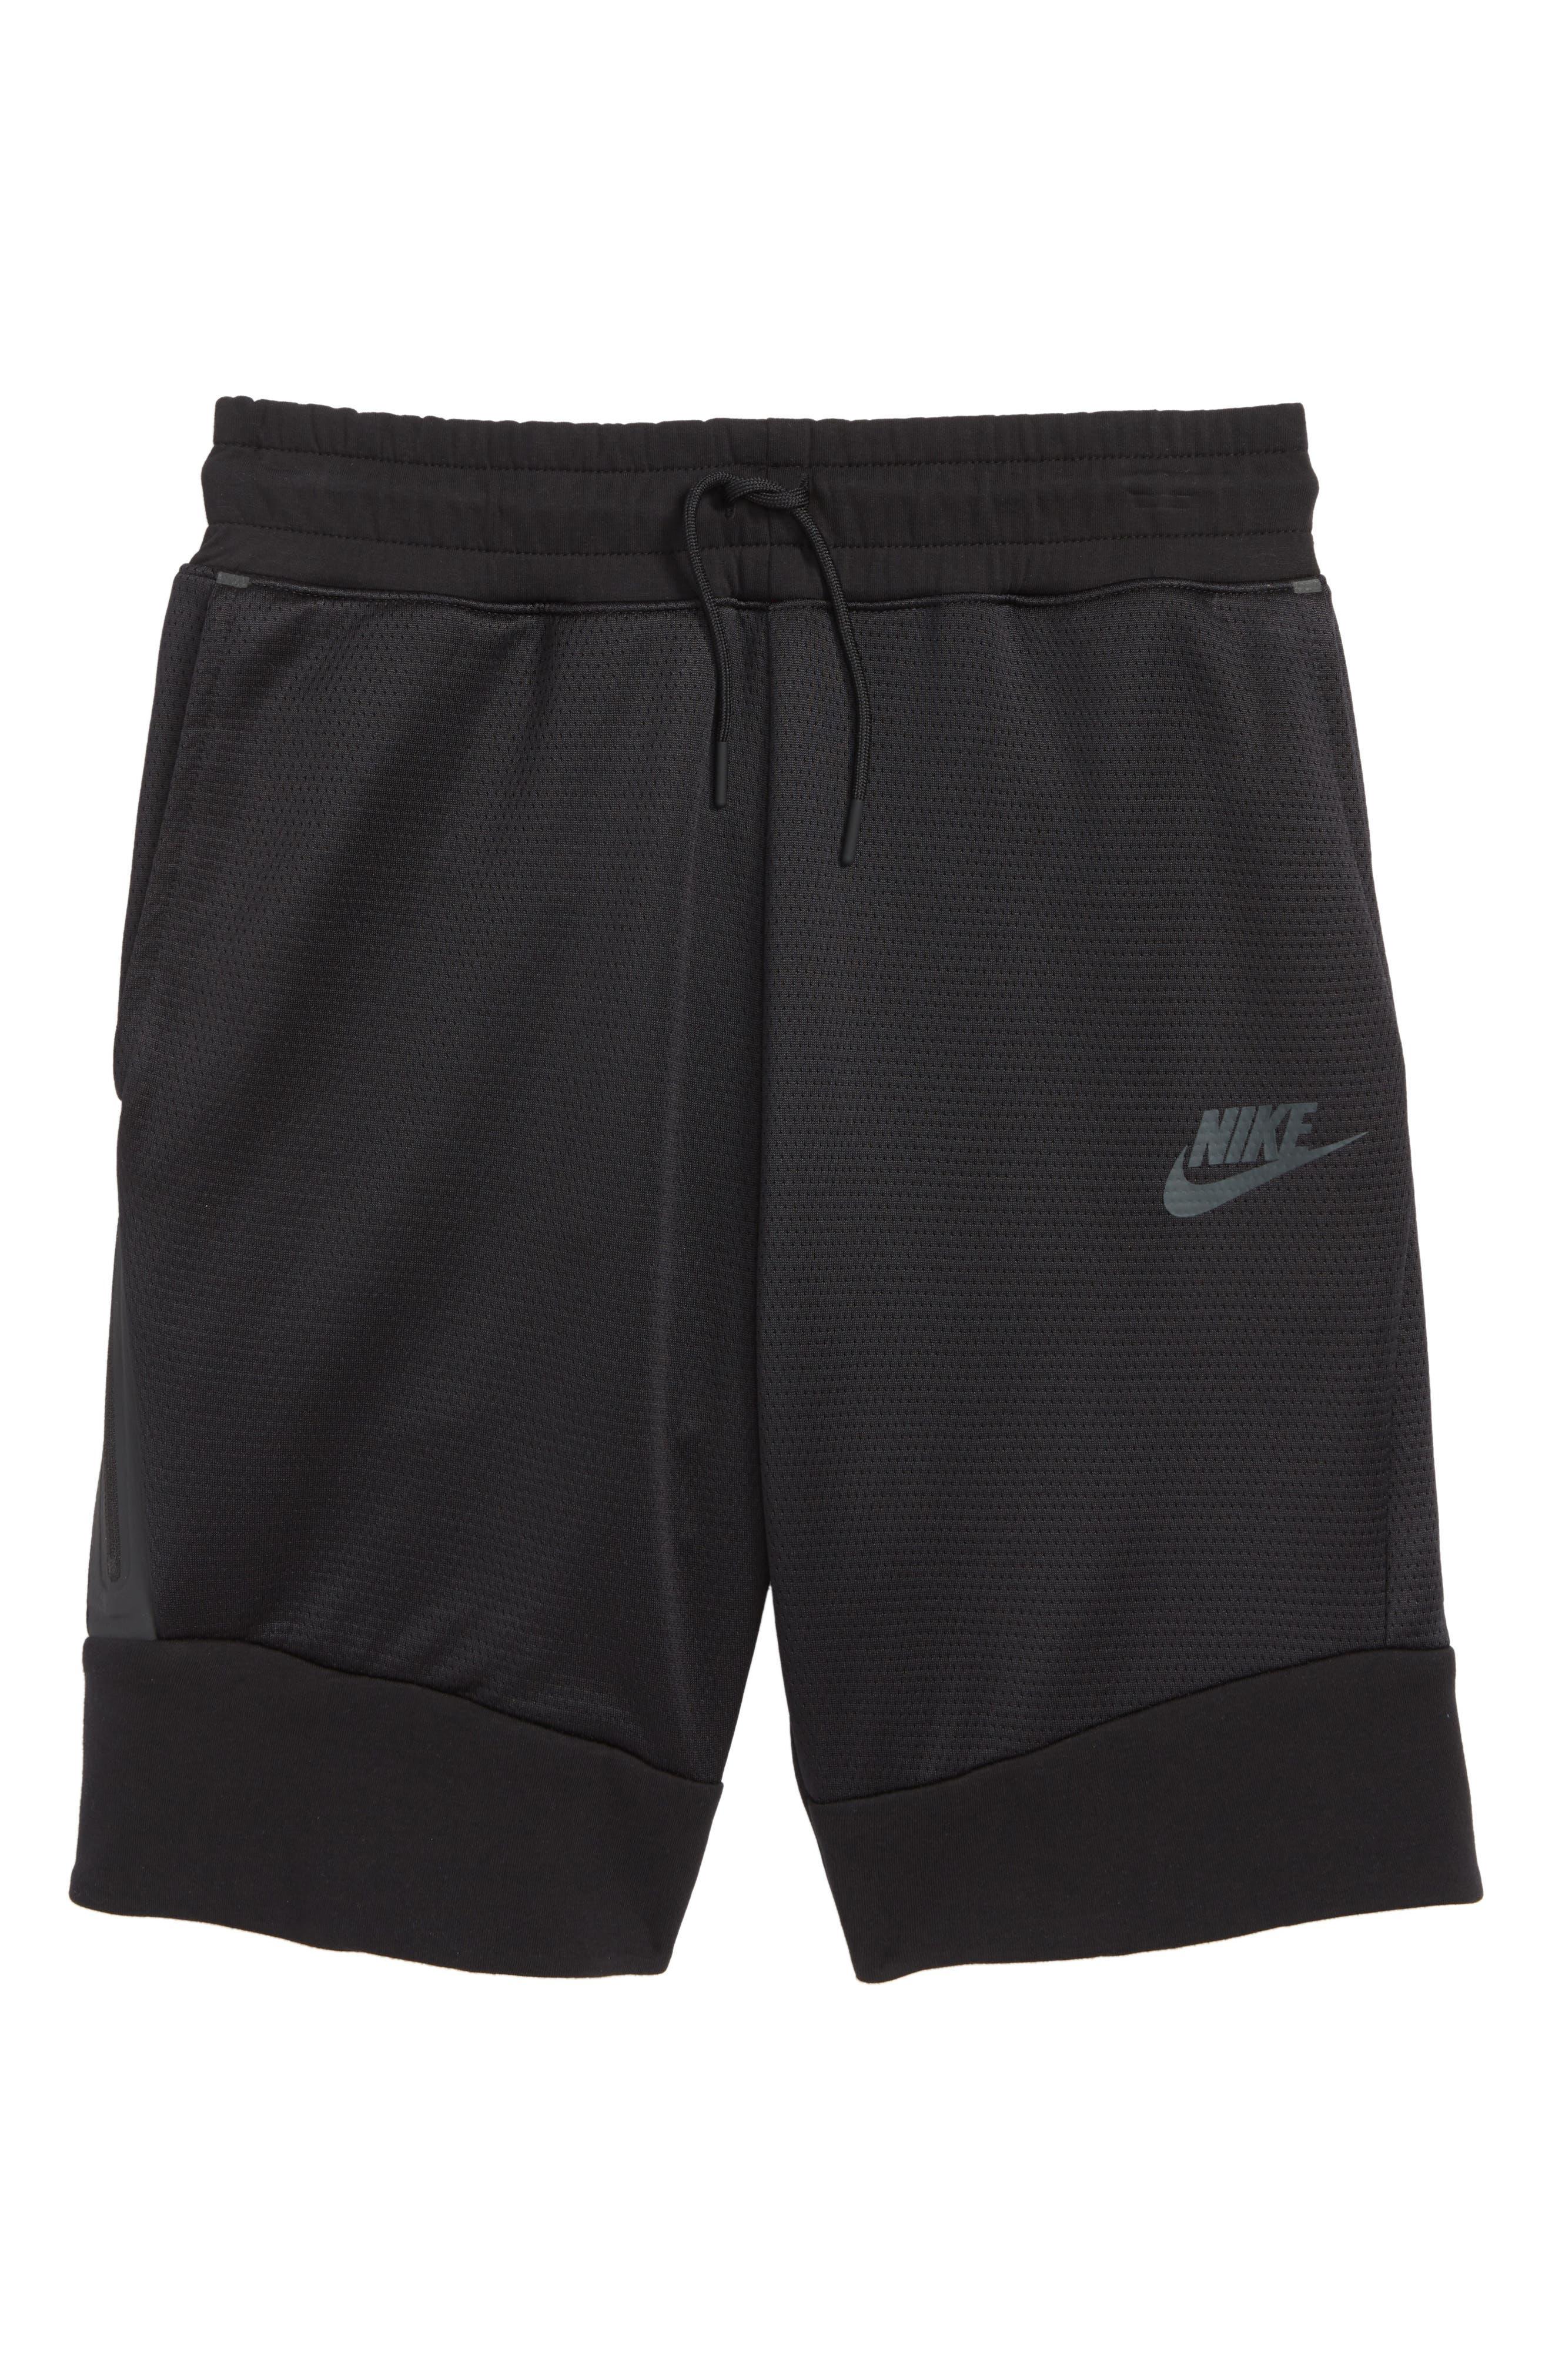 Sportswear Tech Fleece Shorts,                             Main thumbnail 1, color,                             010